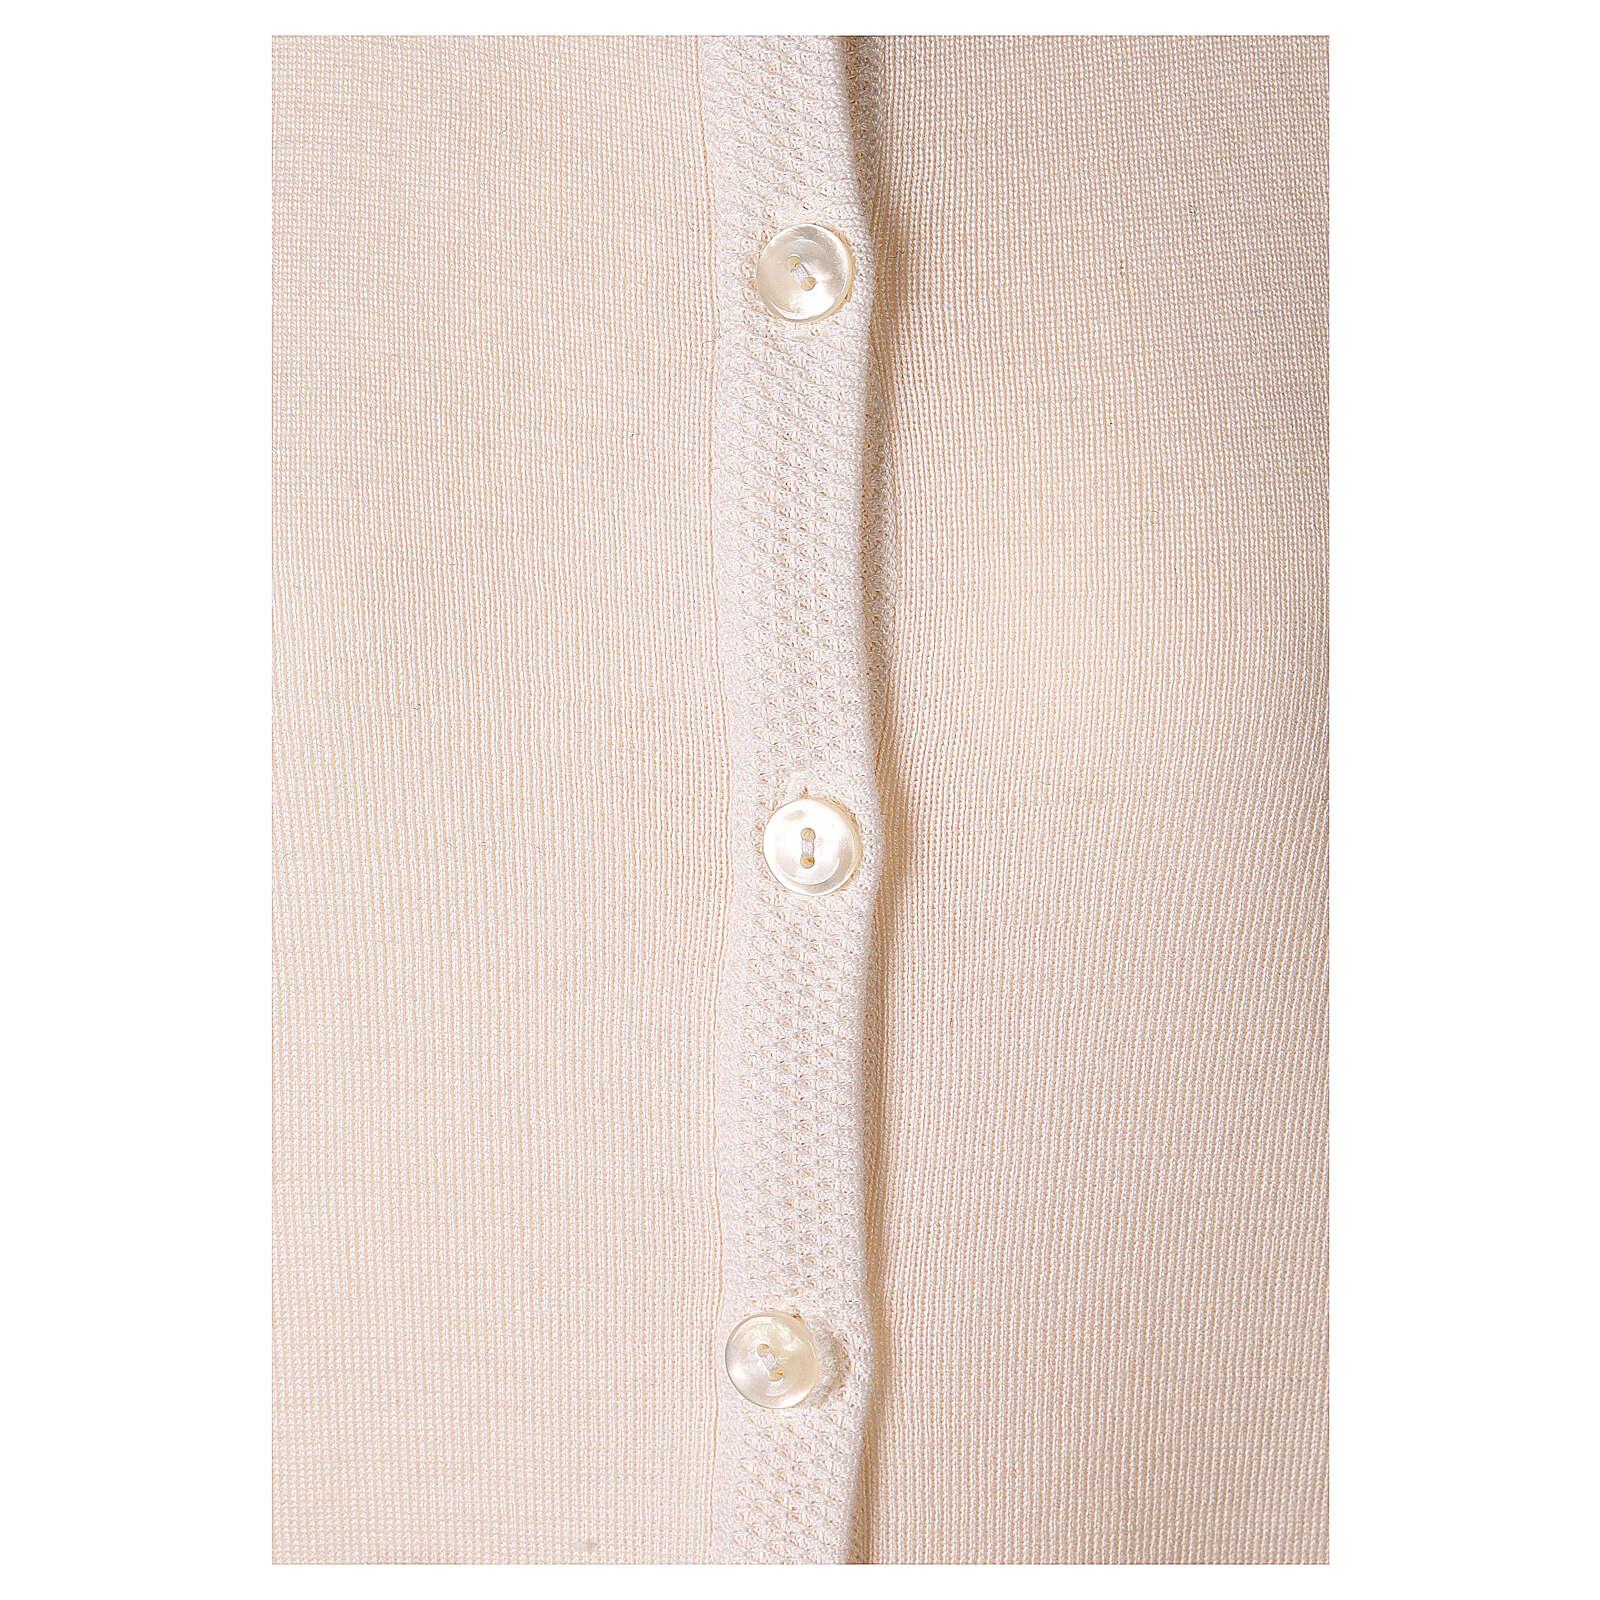 Nun white crew neck cardigan with pockets PLUS SIZES 50% merino wool 50% acrylic In Primis 4